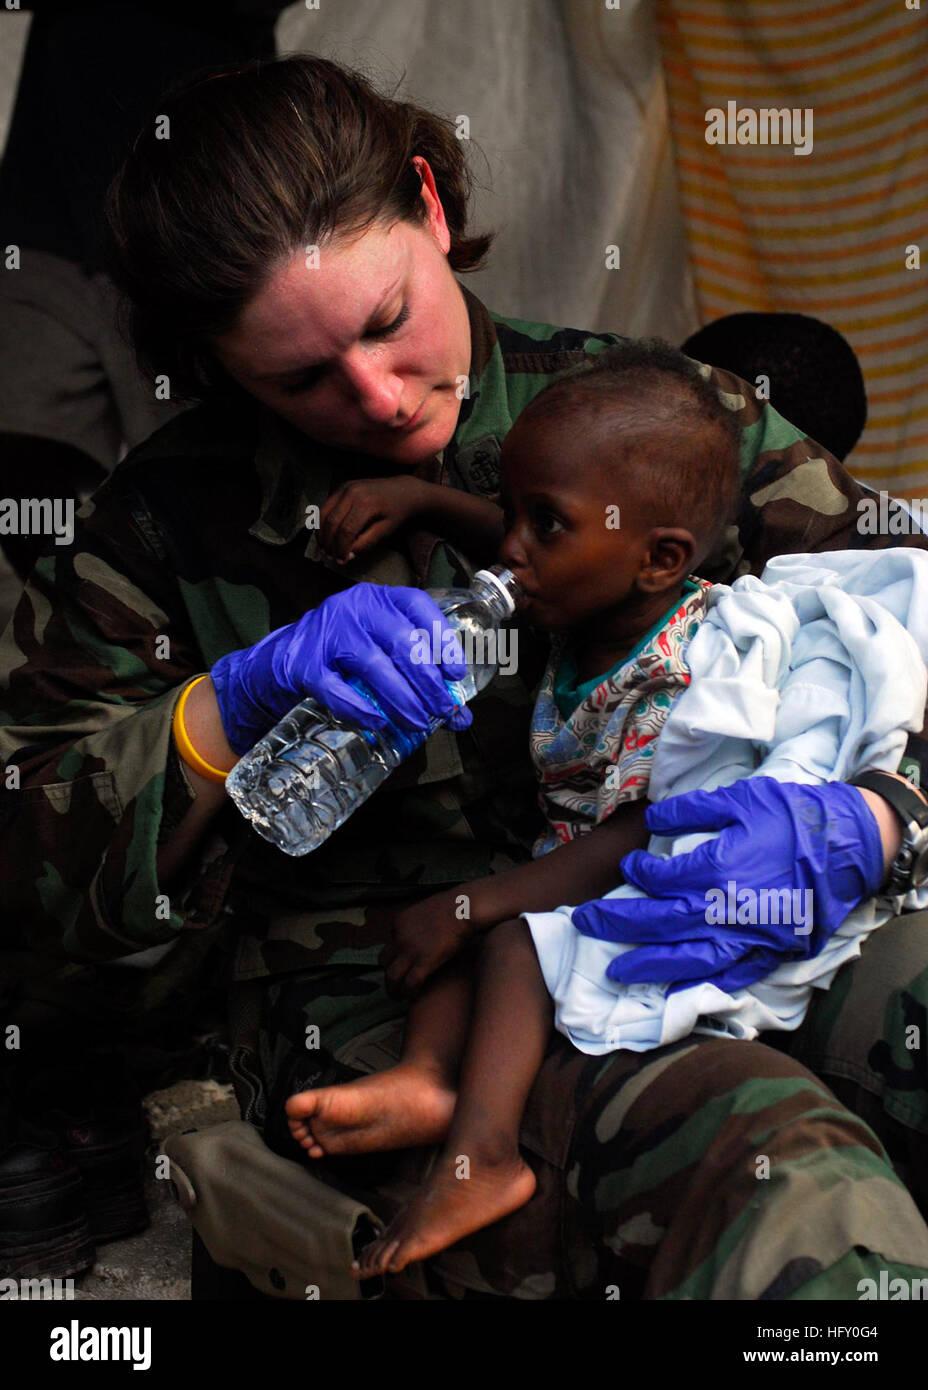 100119-N-5244H-032 BONEL, Haiti (Jan. 19, 2010) Chief Hospital Corpsman Rioni, a member of a Maritime Civil Affairs Stock Photo